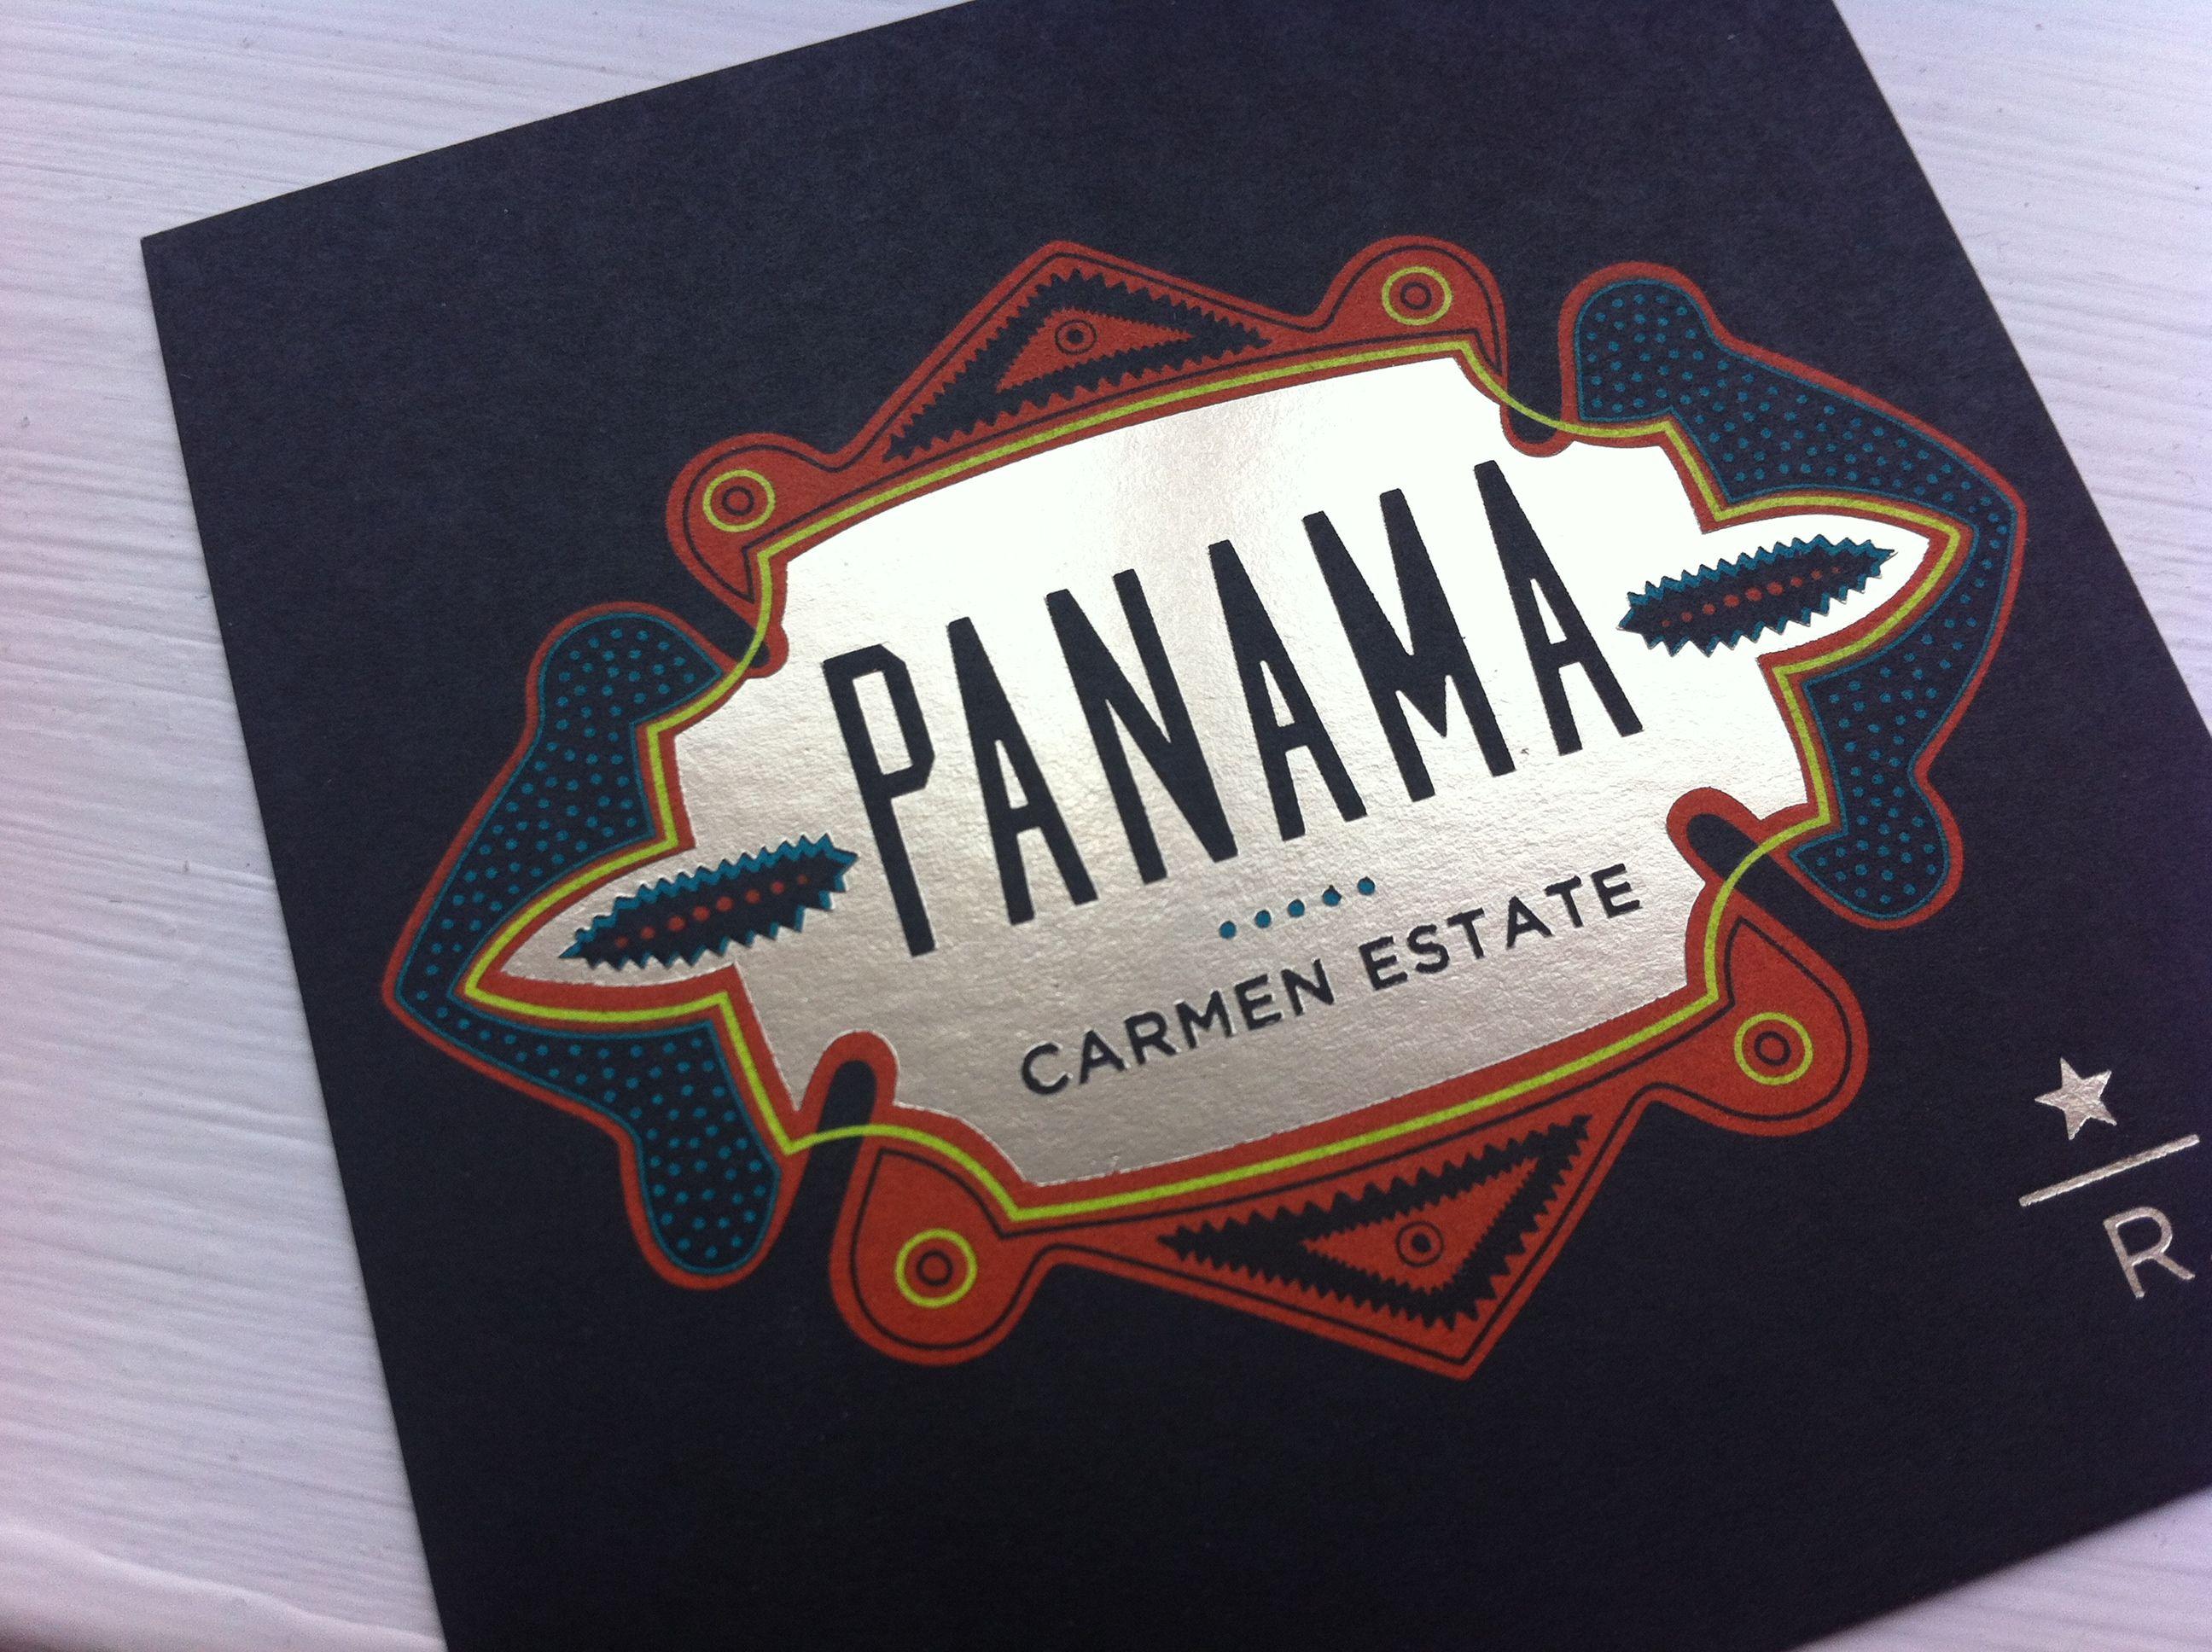 Starbucks Reserve Panama logo